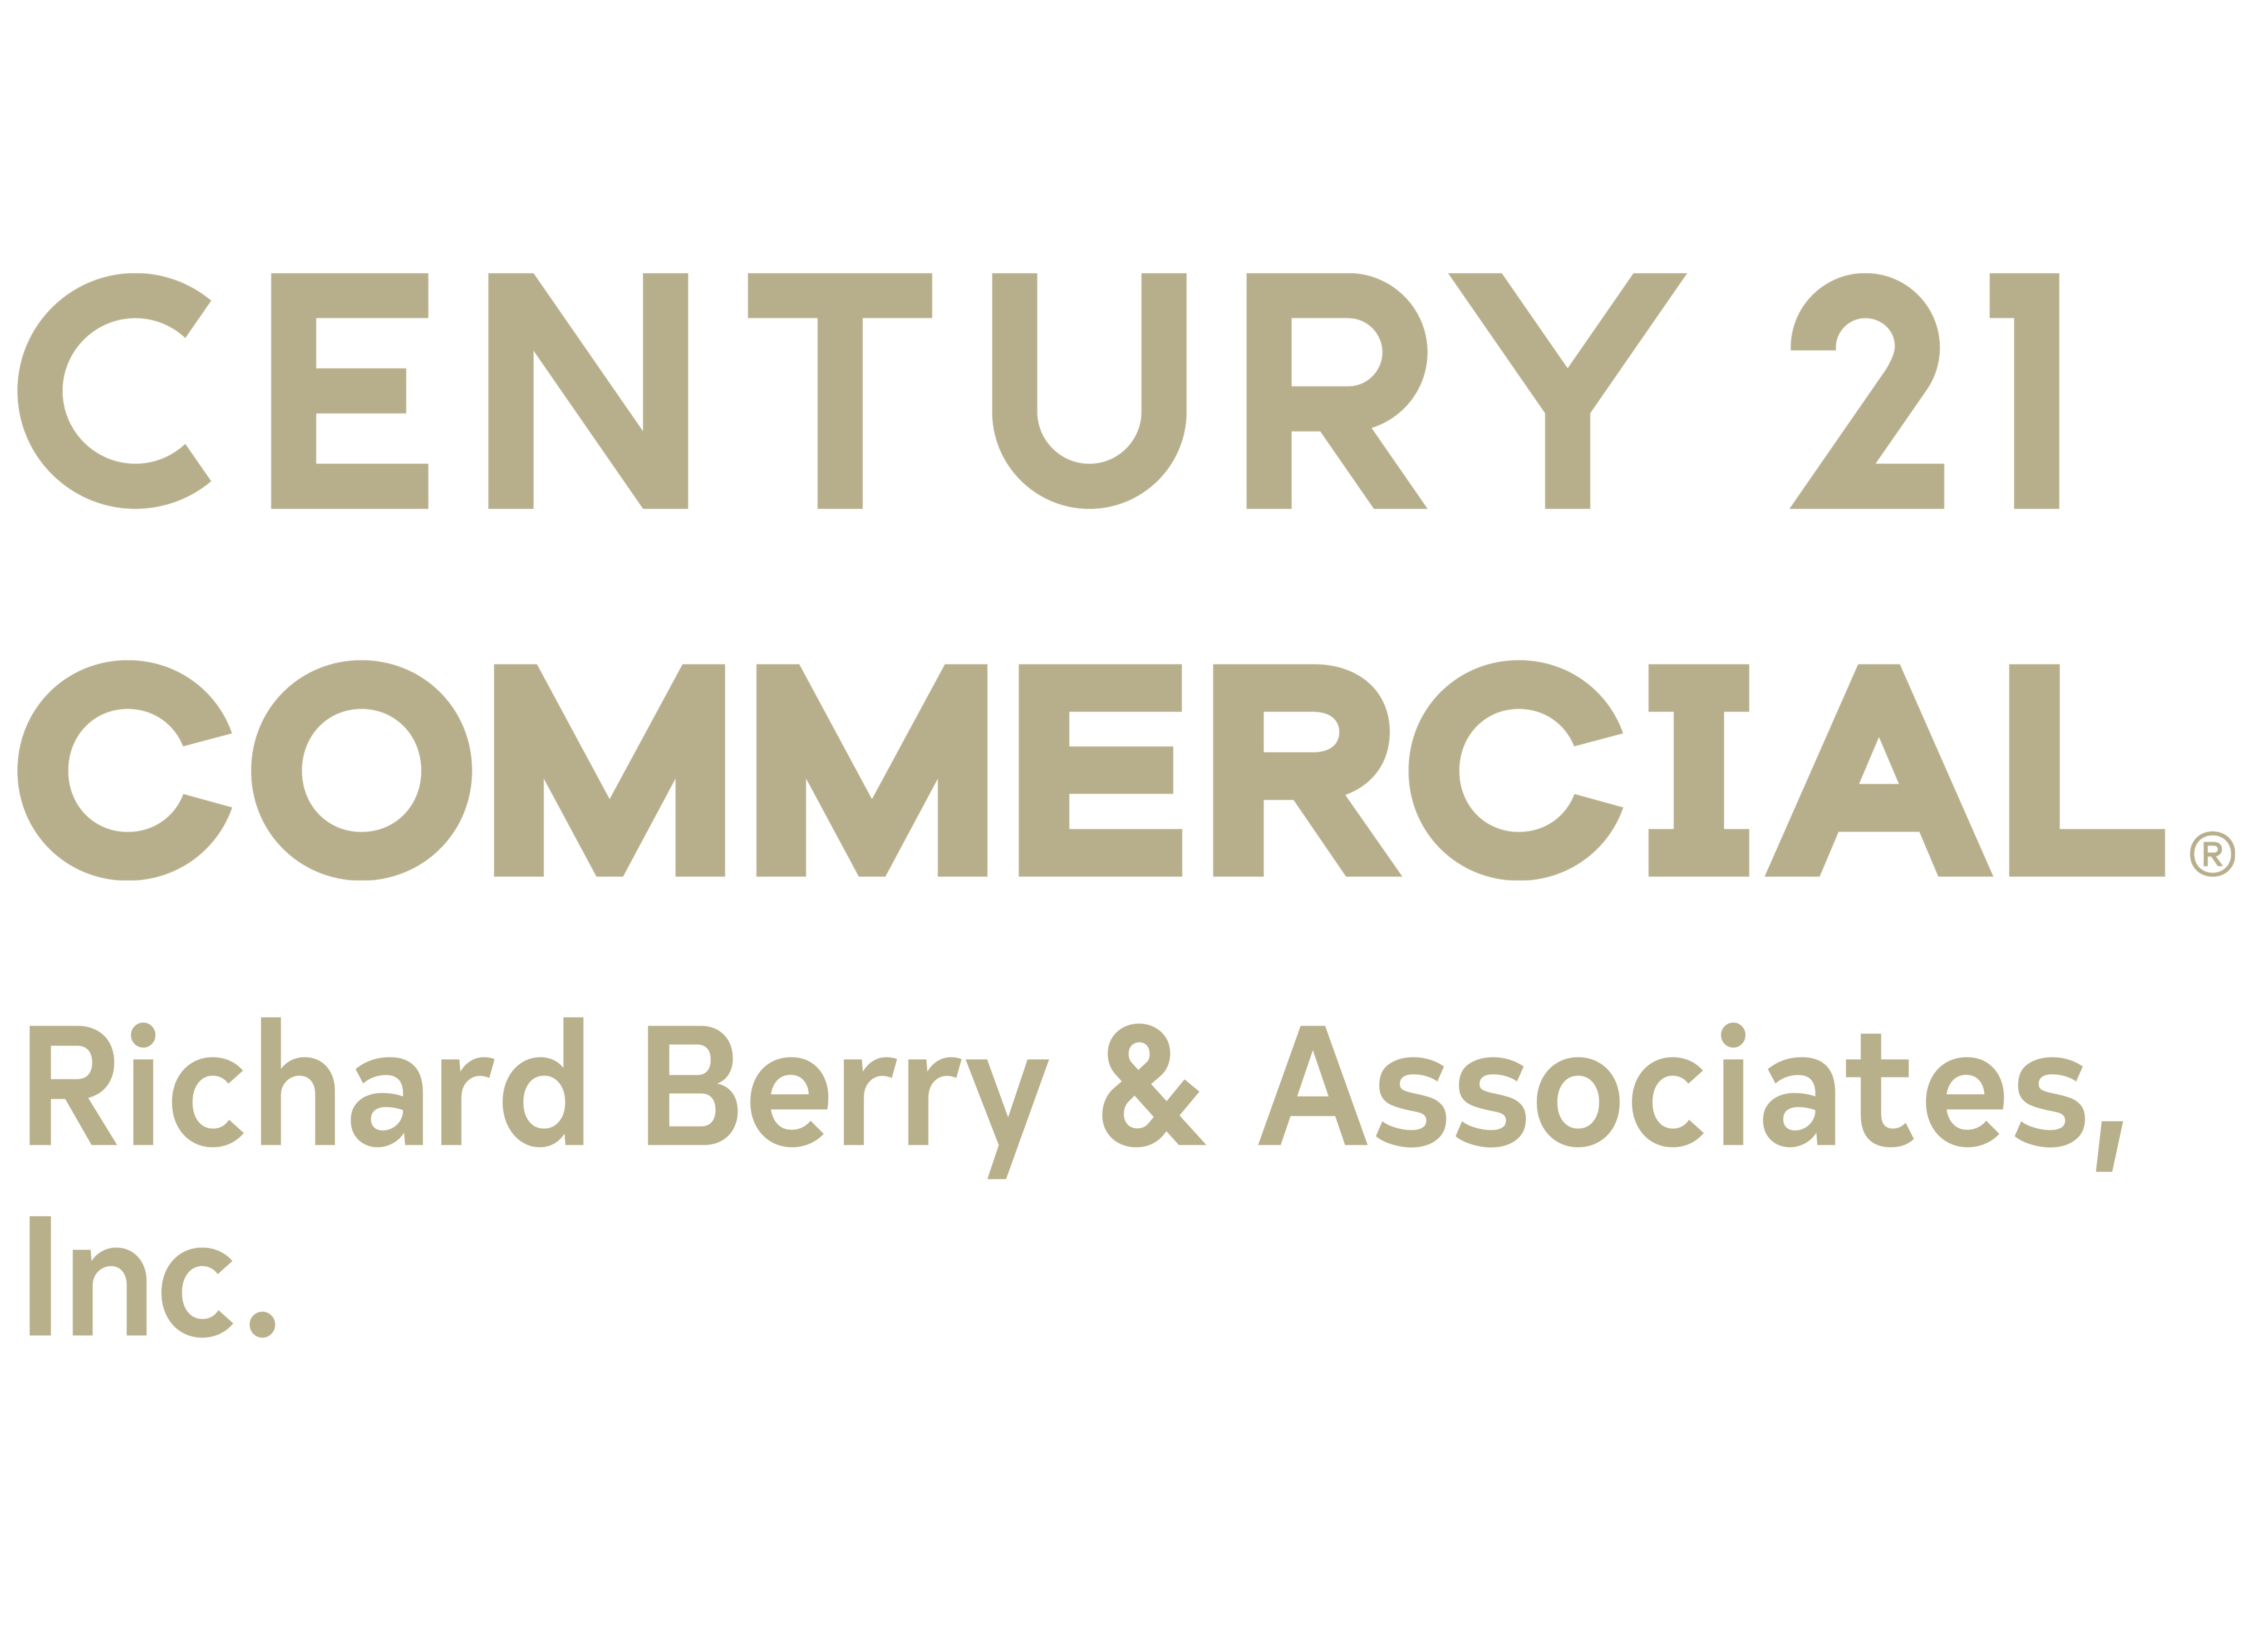 CENTURY 21 Richard Berry & Associates, Inc.